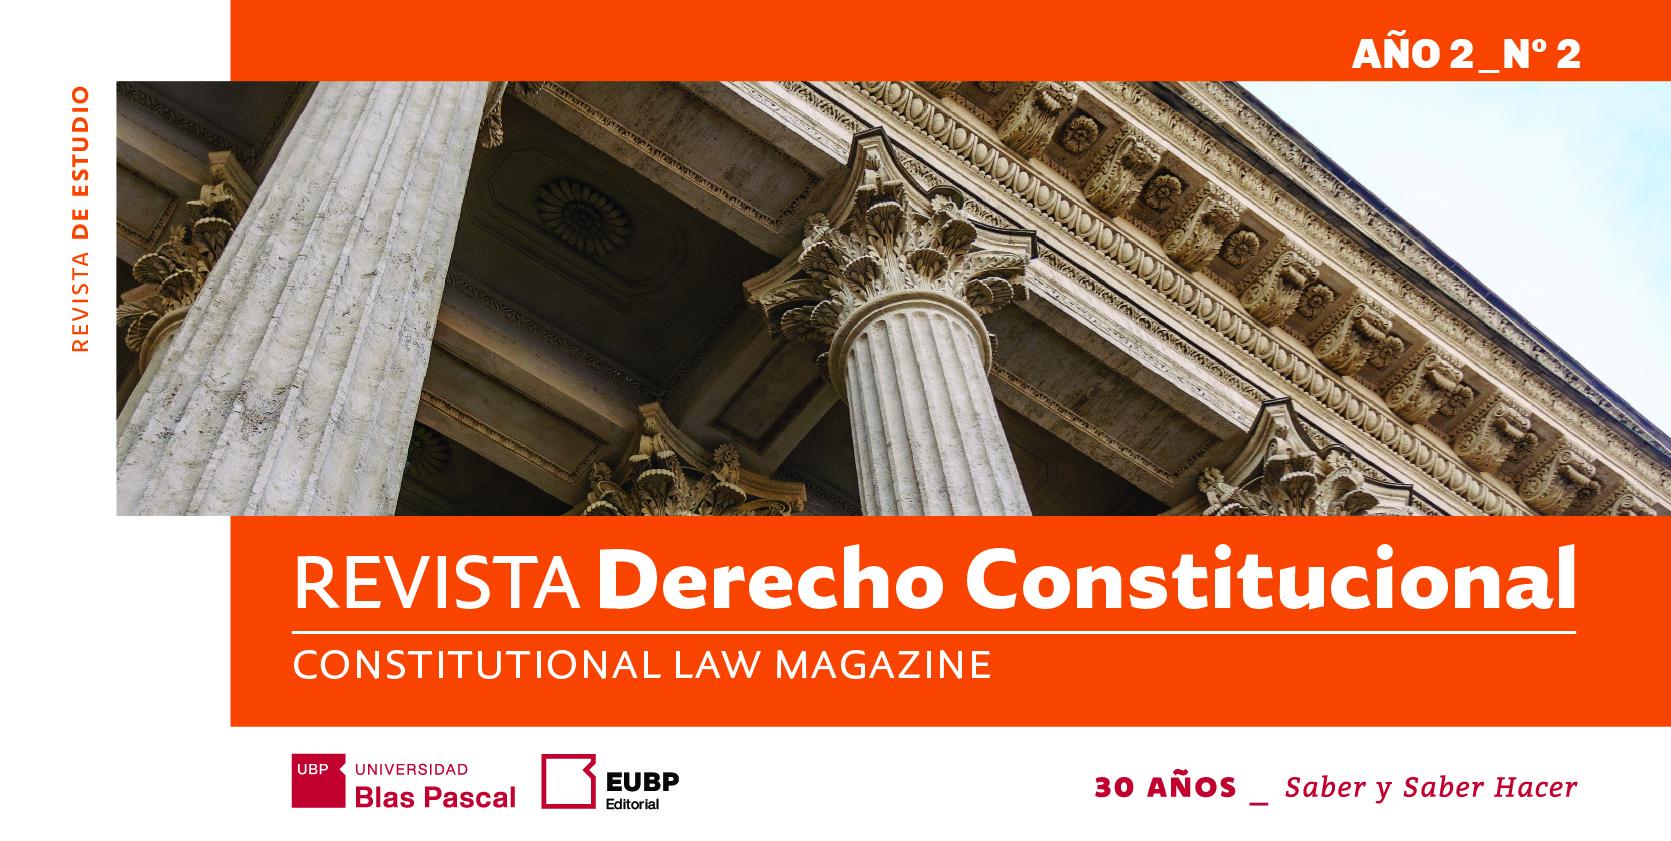 Call For Papers: Revista Derecho Constitucional